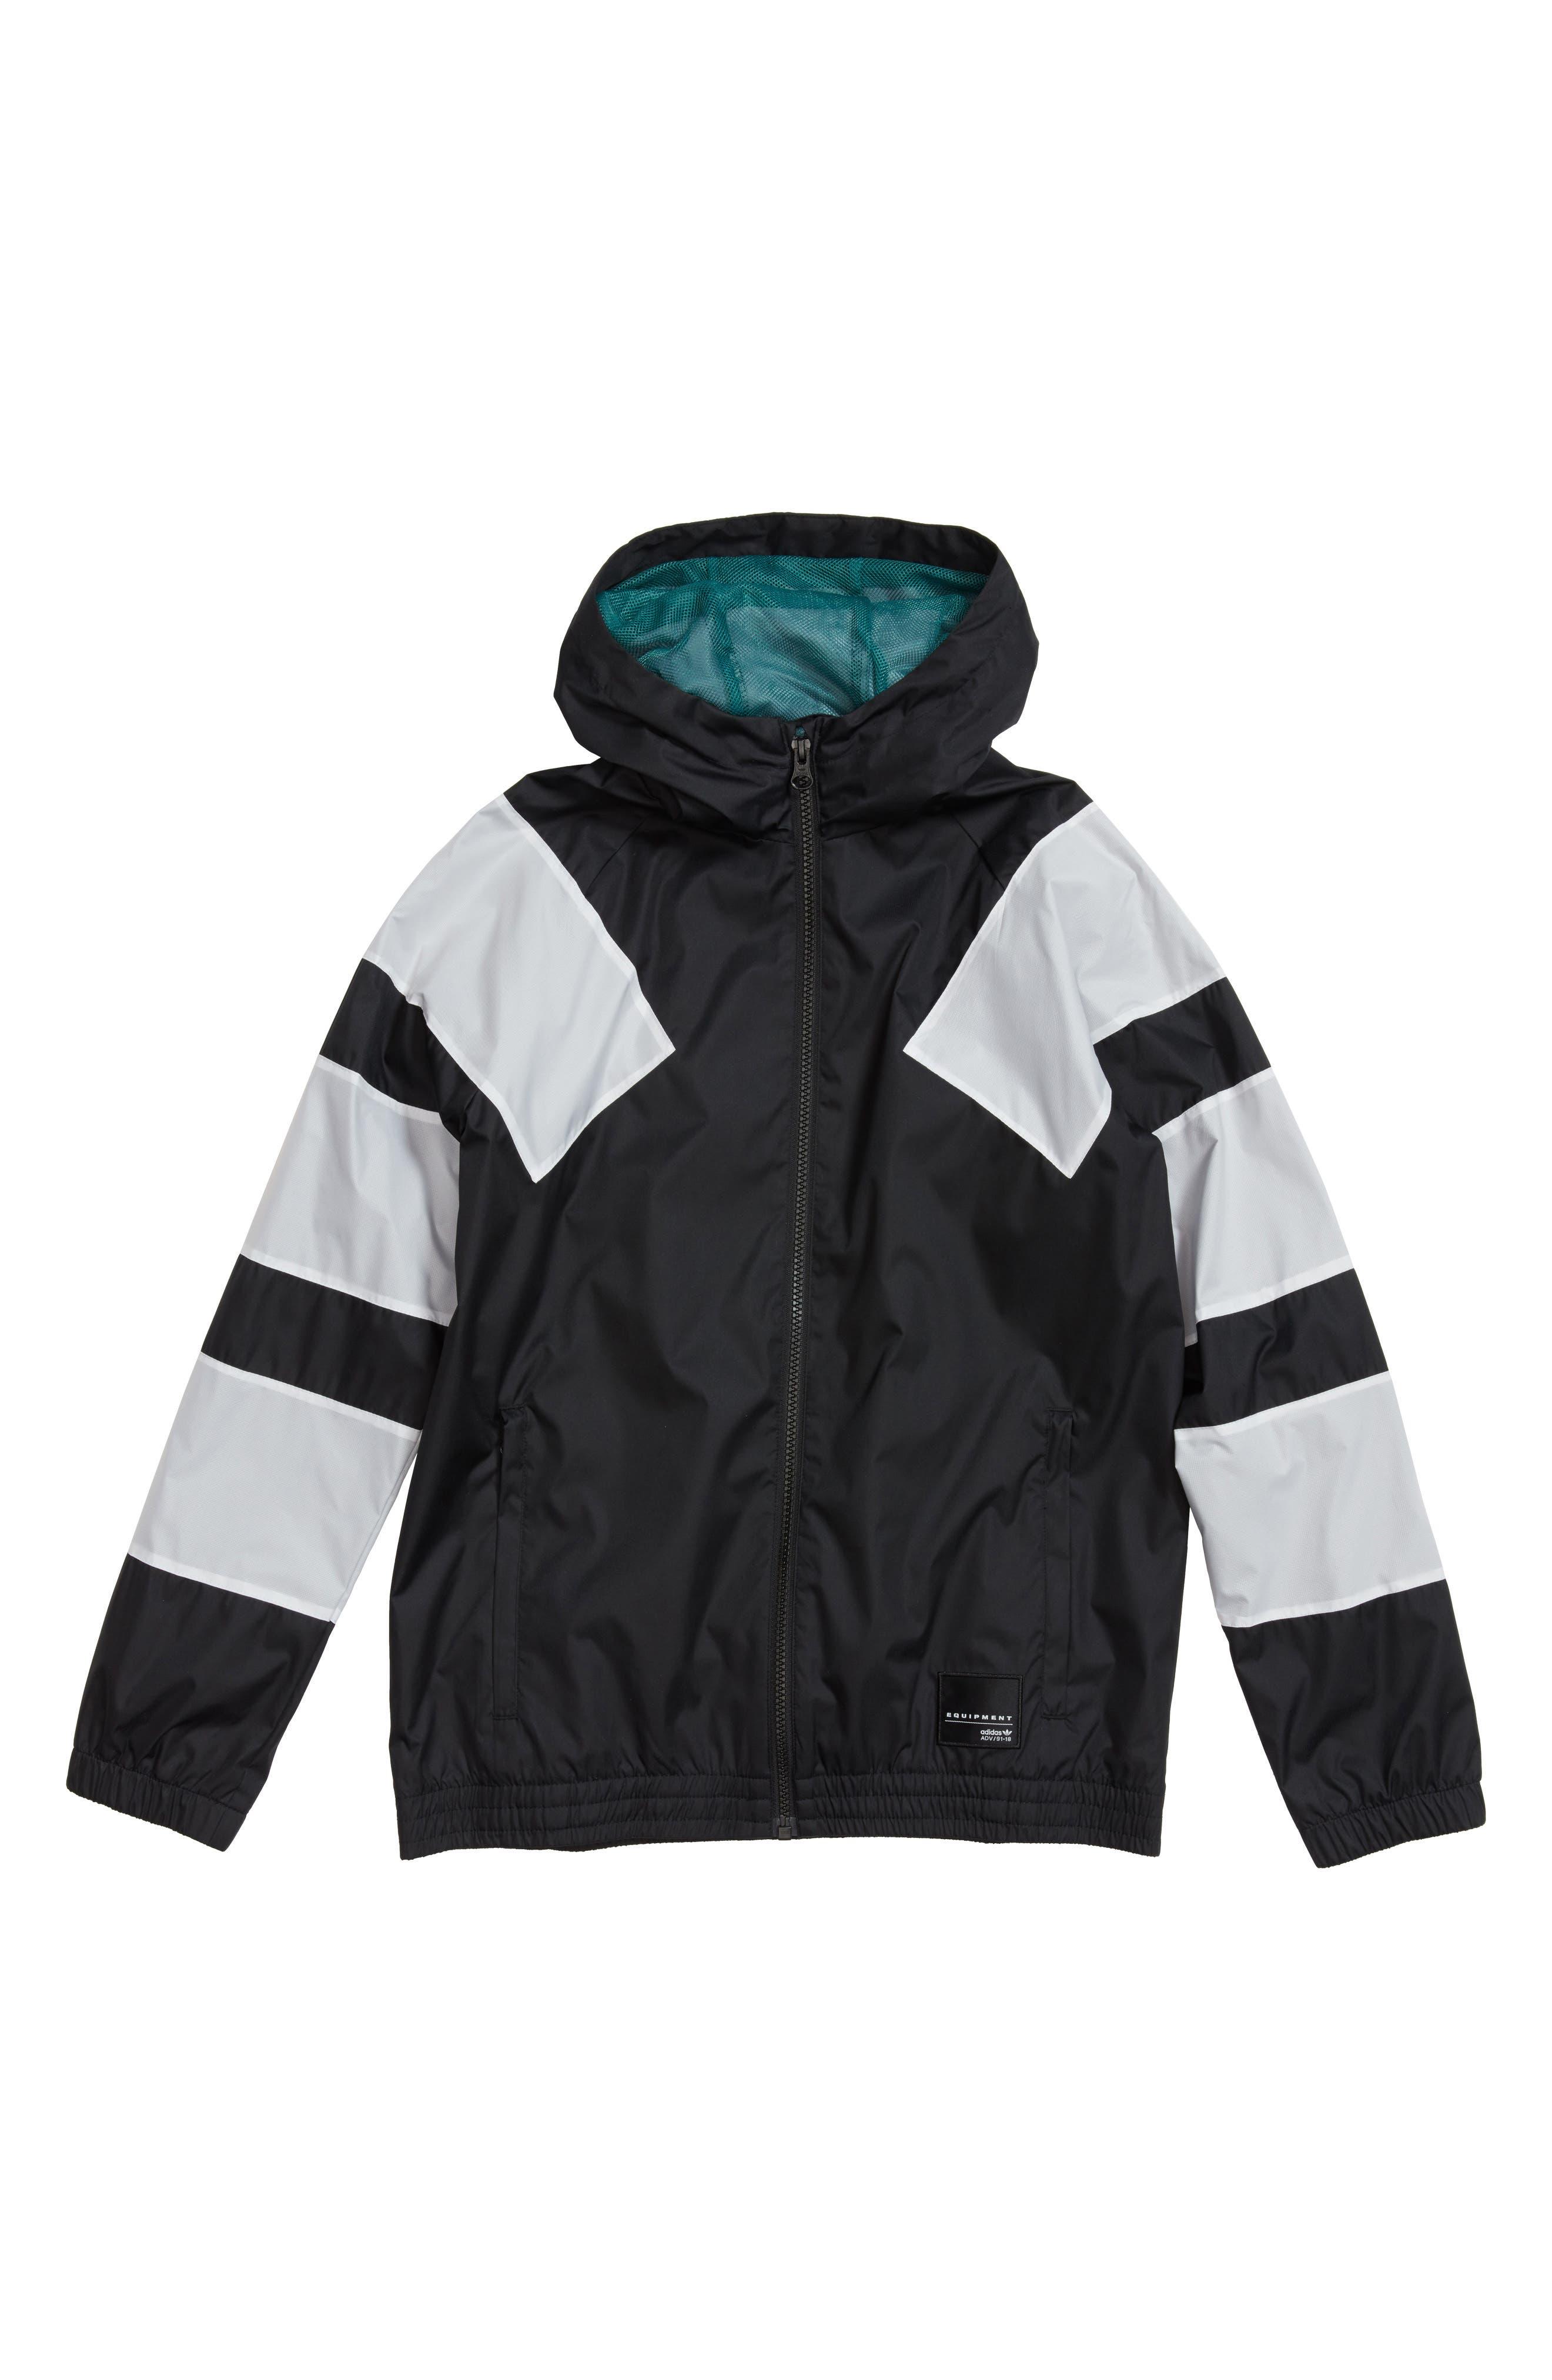 EQT Hooded Windbreaker Jacket,                         Main,                         color, Black/ White